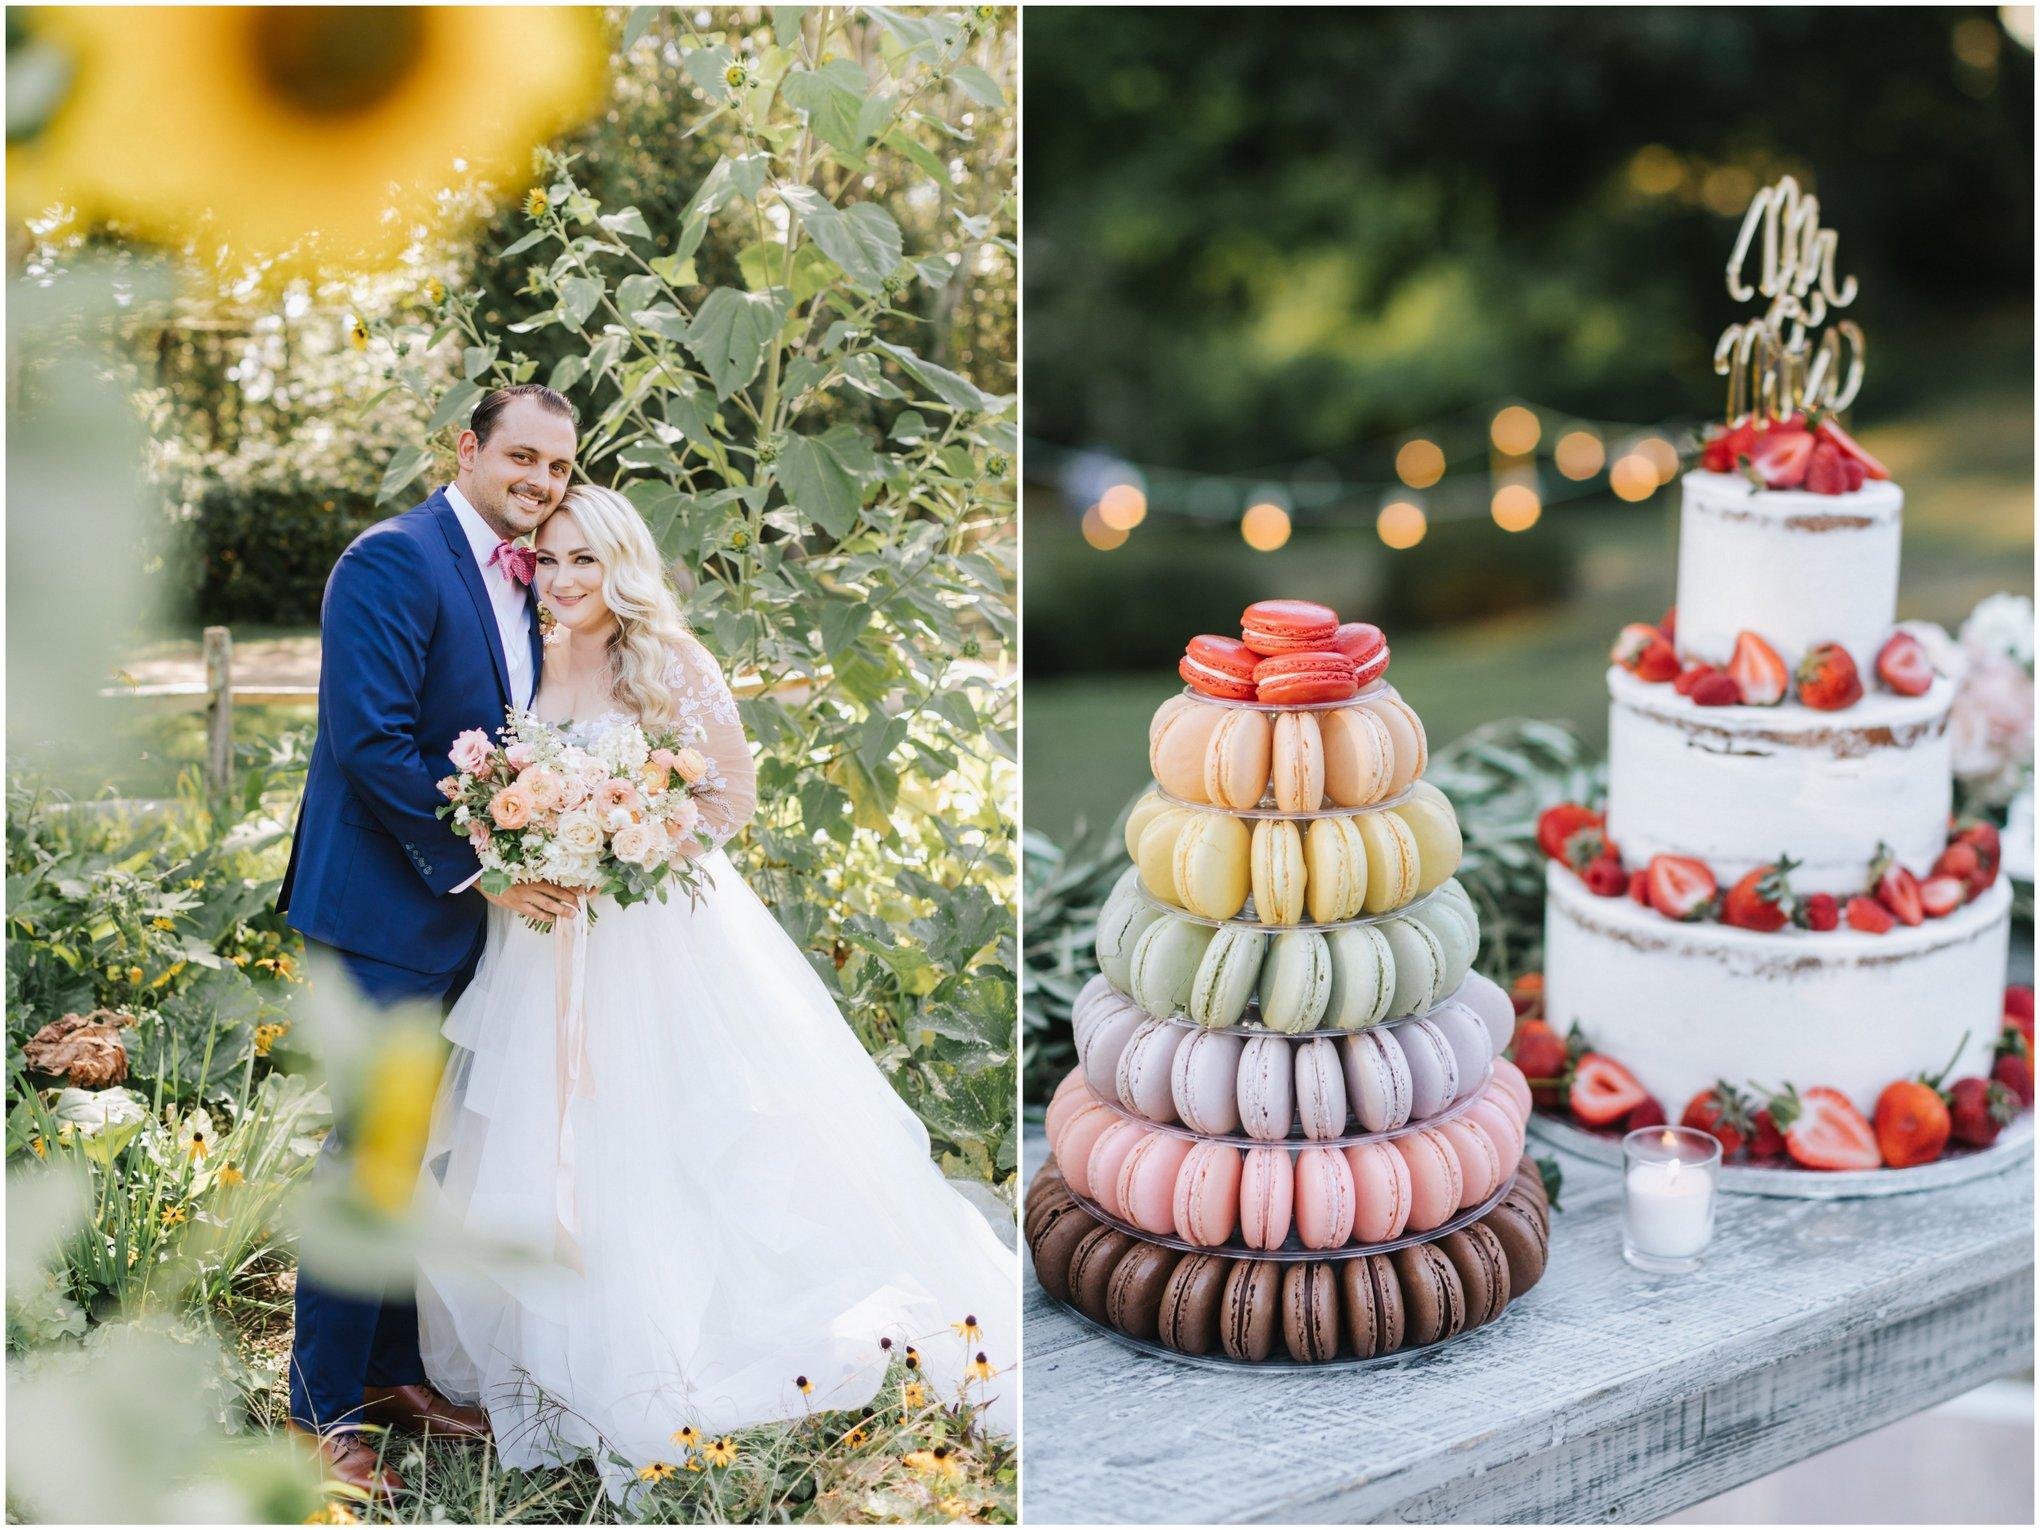 Marthas-Vineyard-Wedding-Photographer-Beach-Plum-Inn-36.jpg